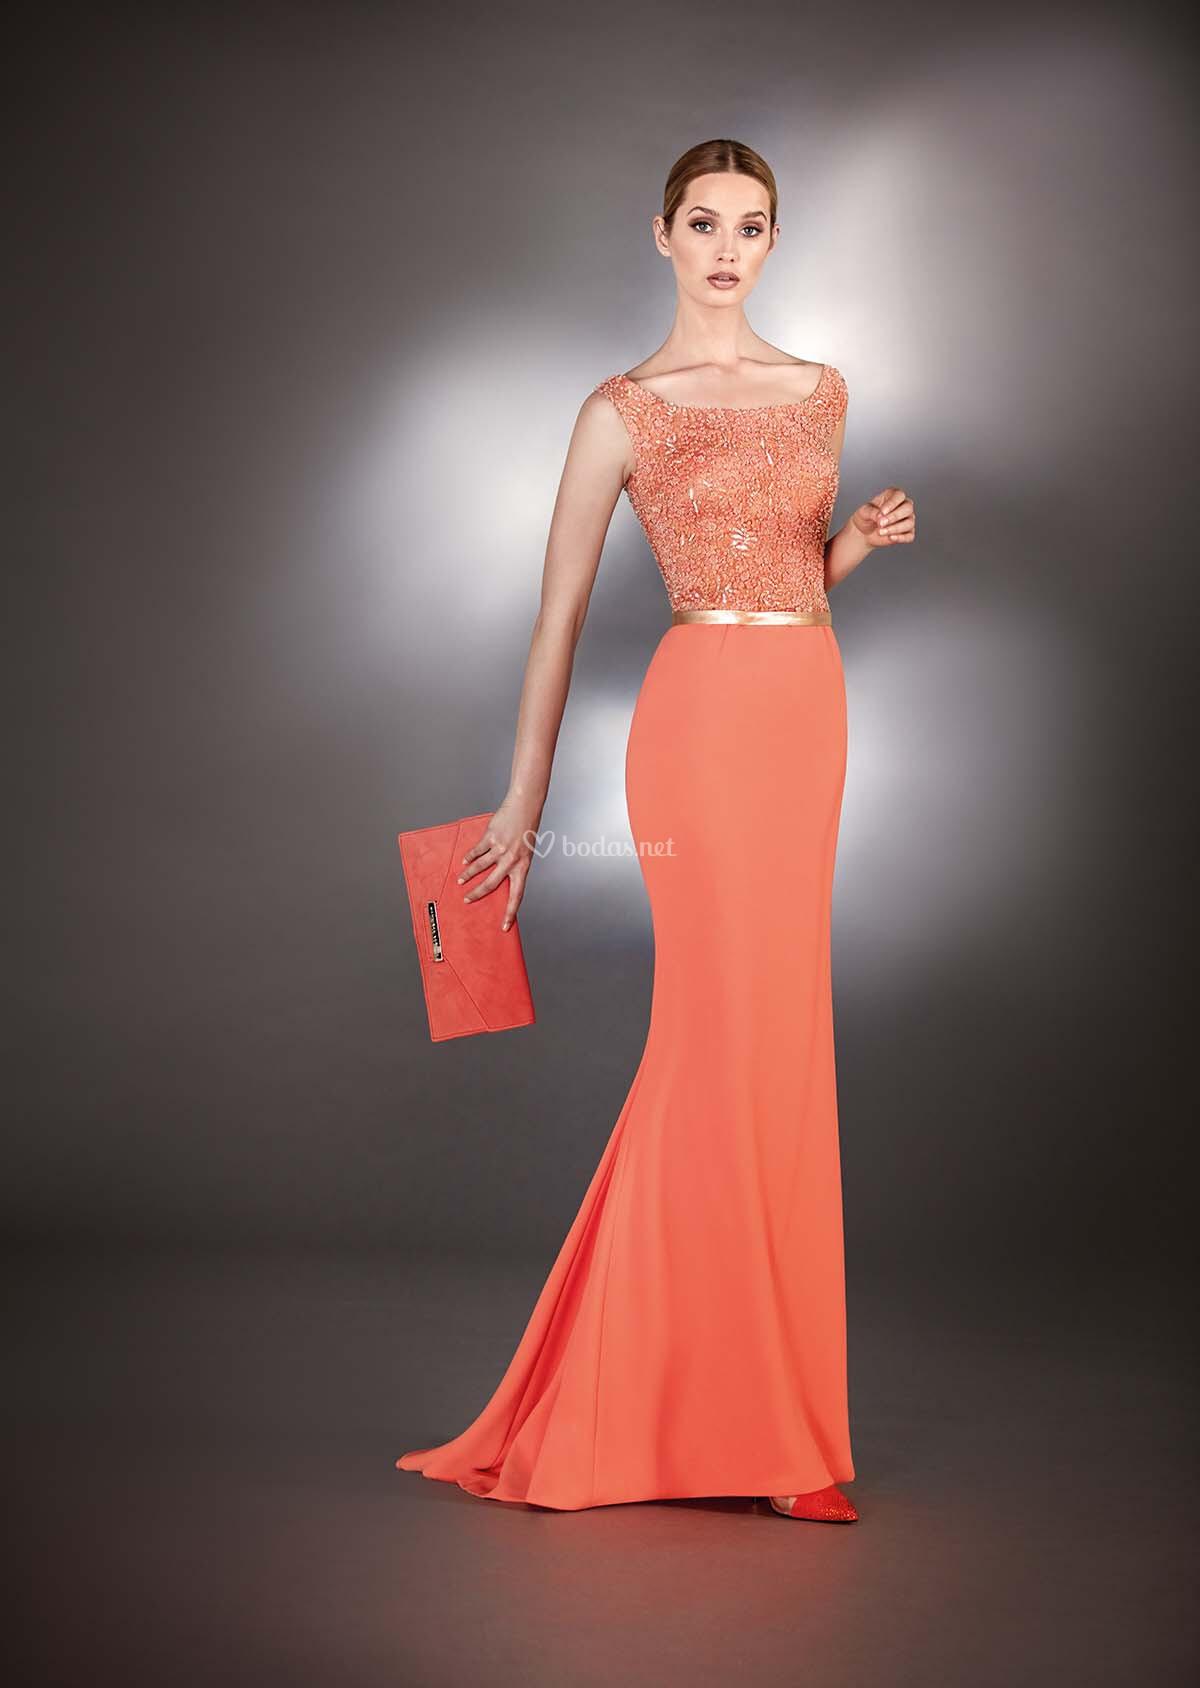 be2a7a118 Vestido de Madrina de Hannibal Laguna Atelier - TAPIR